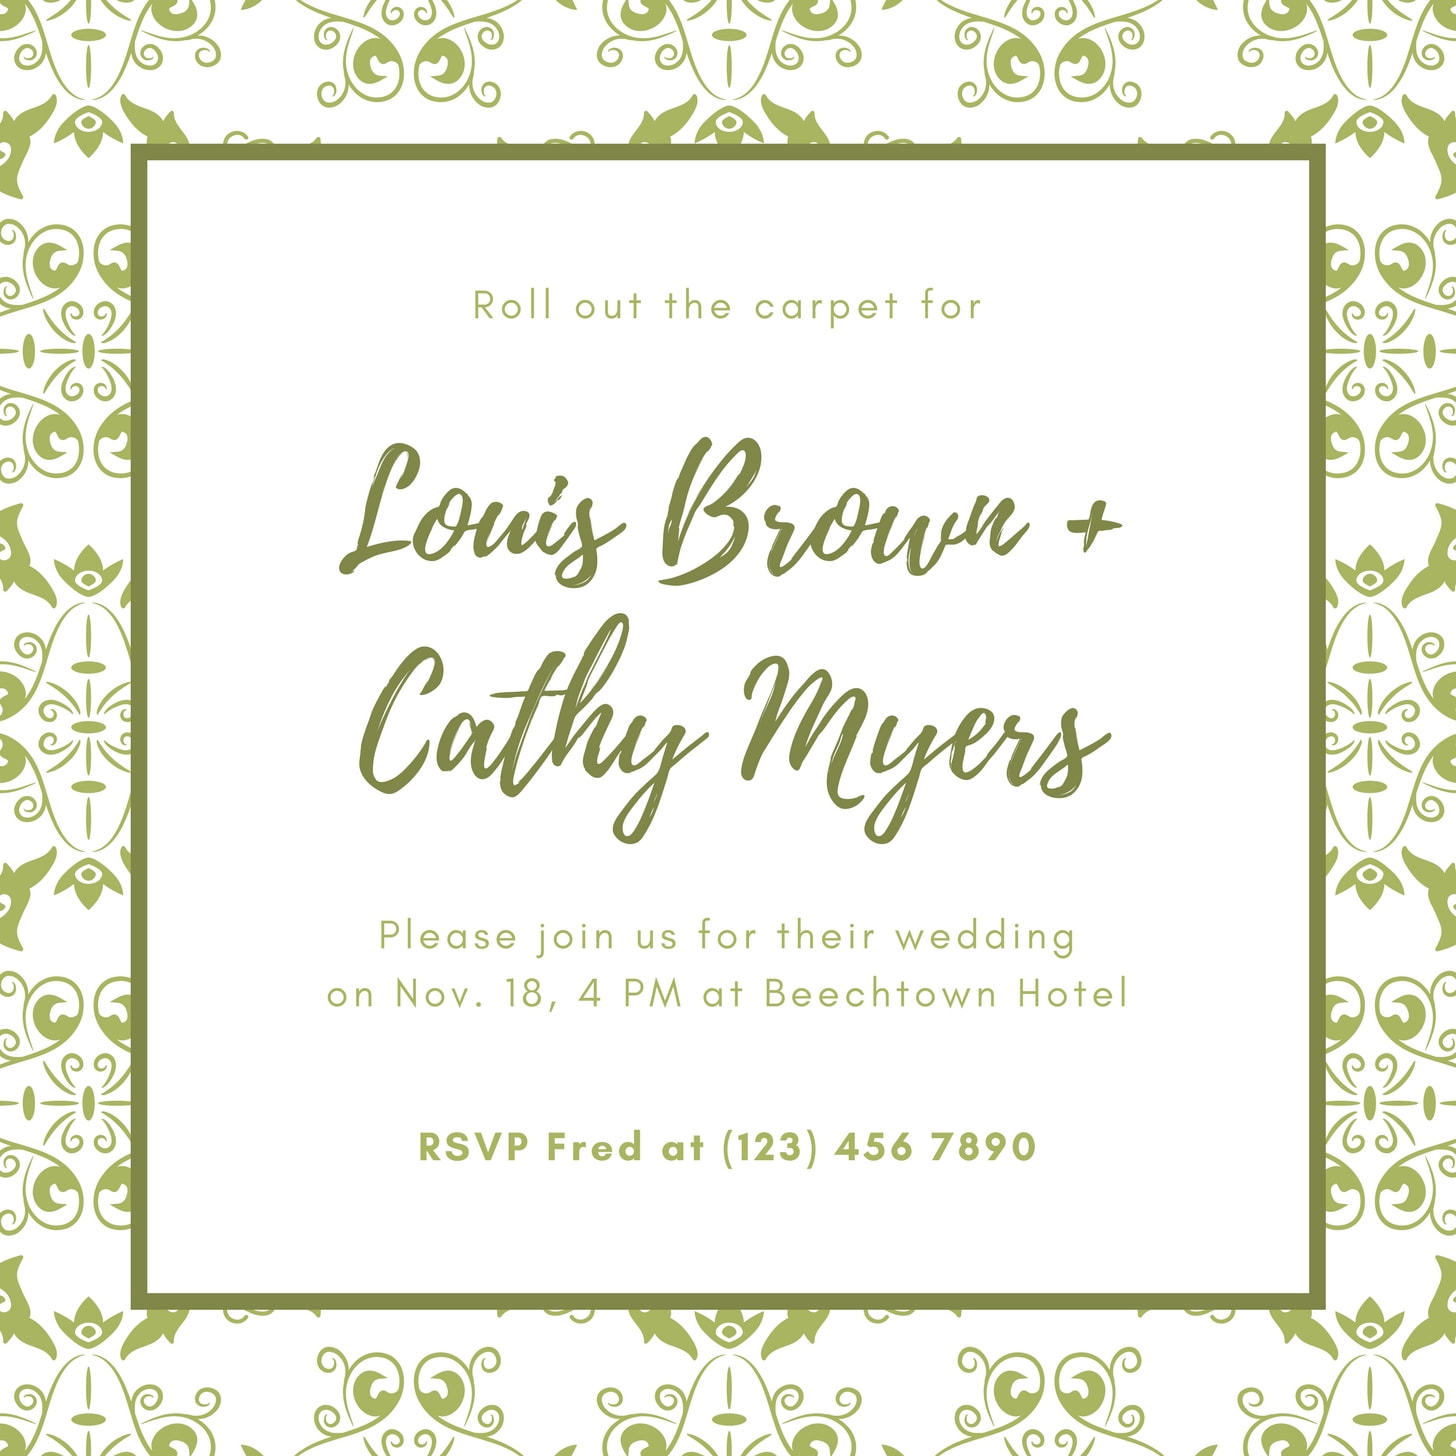 Green Paisley Royal Wedding Invitation